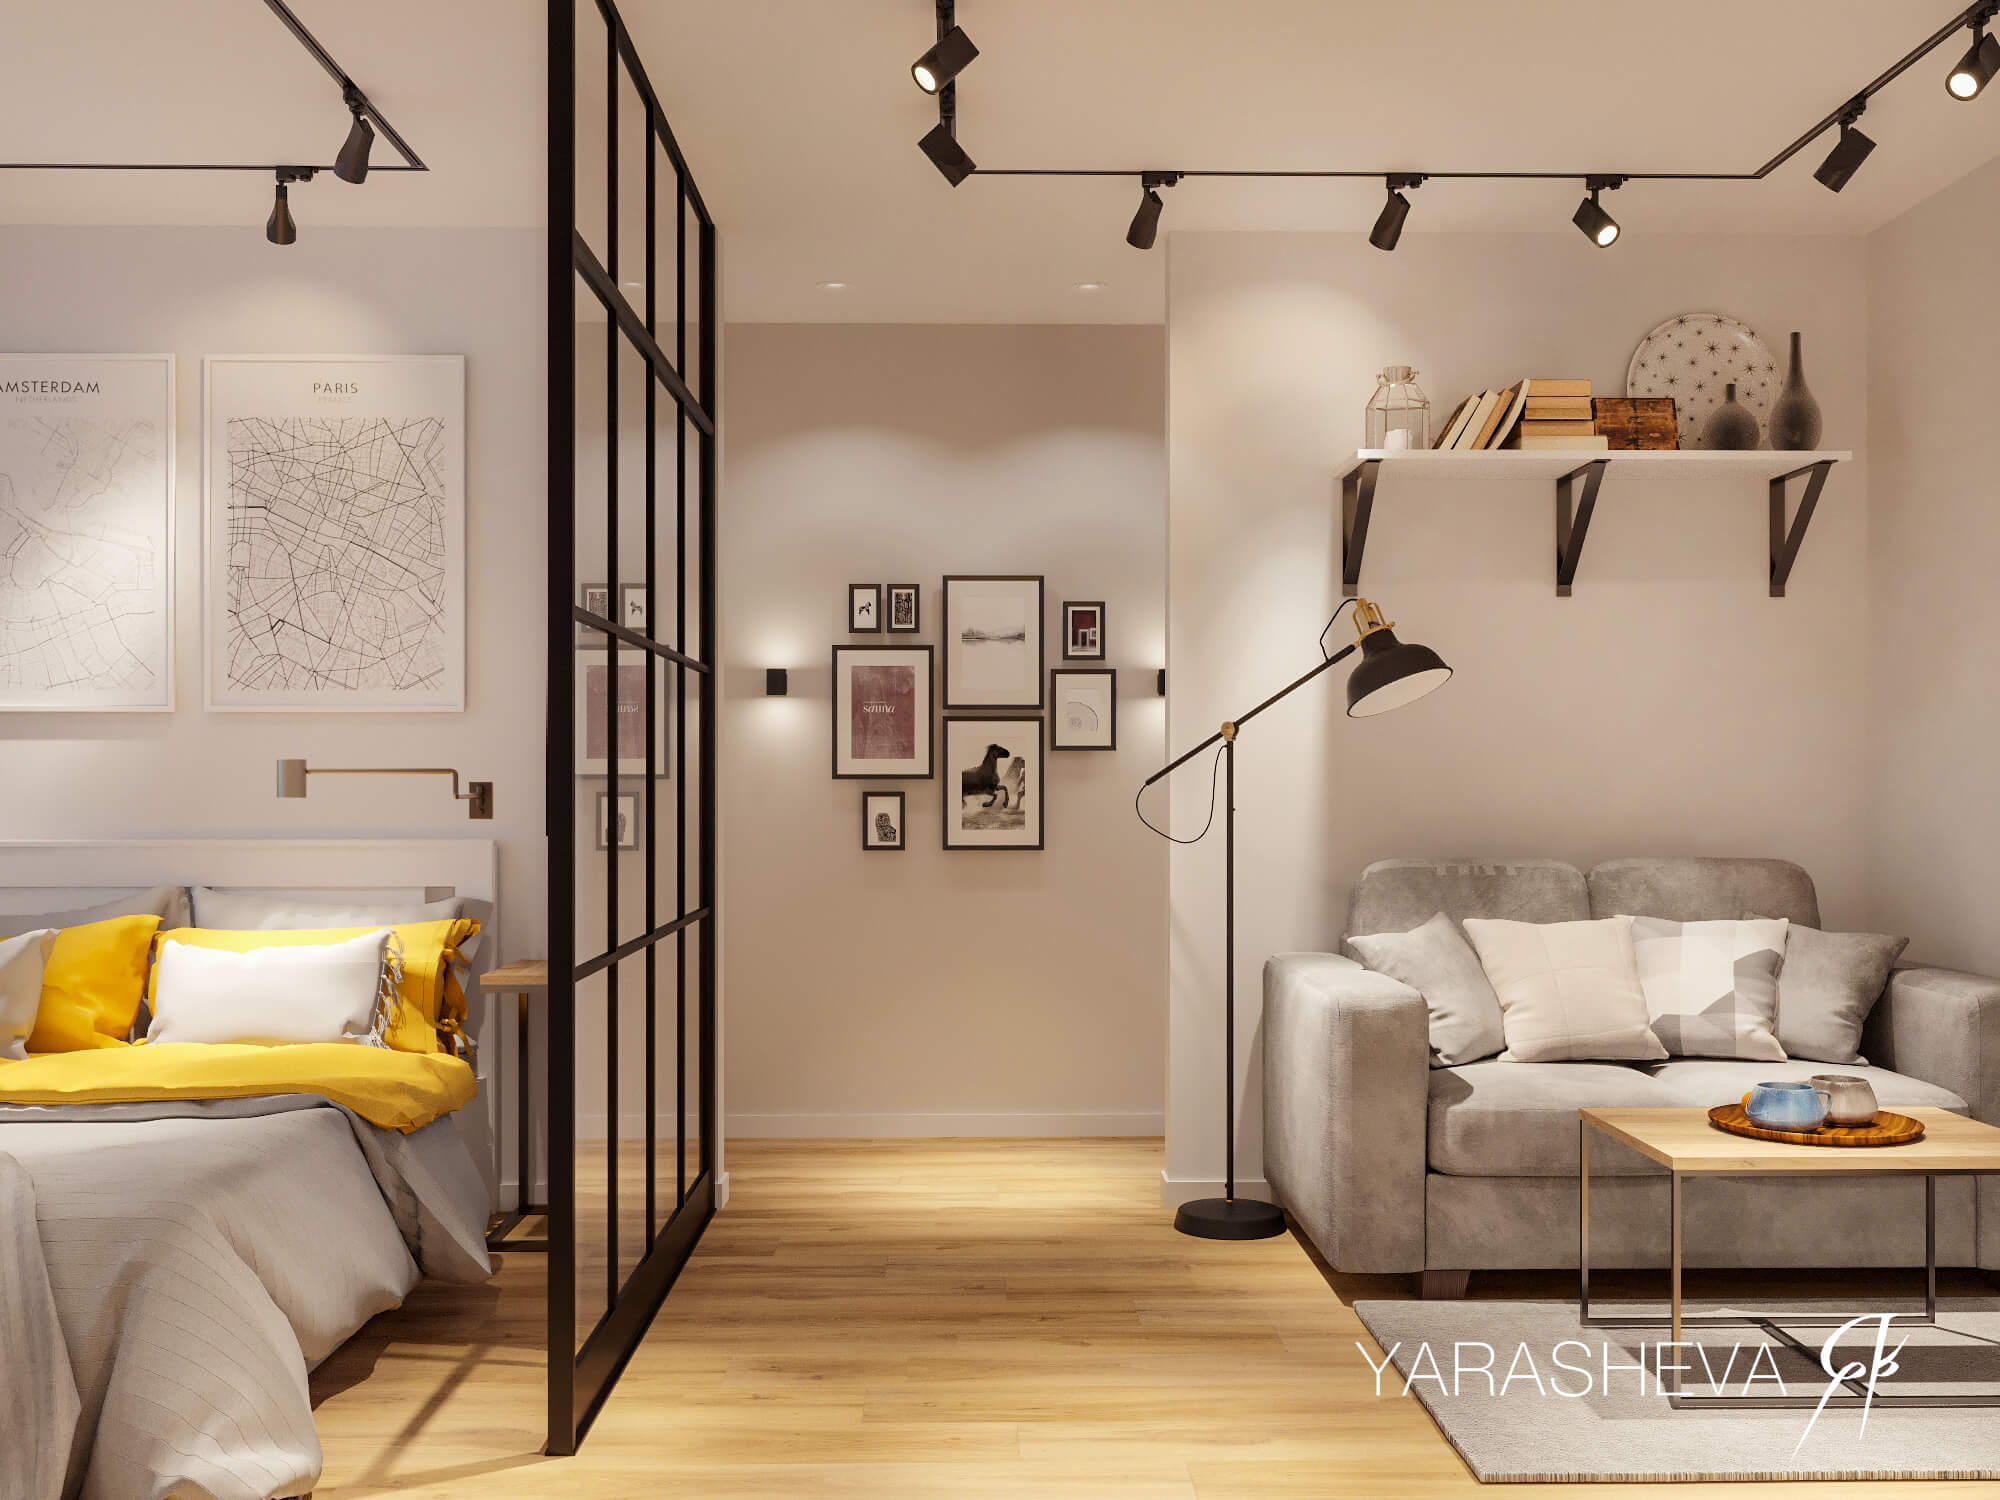 interior design of a living room-bedroom